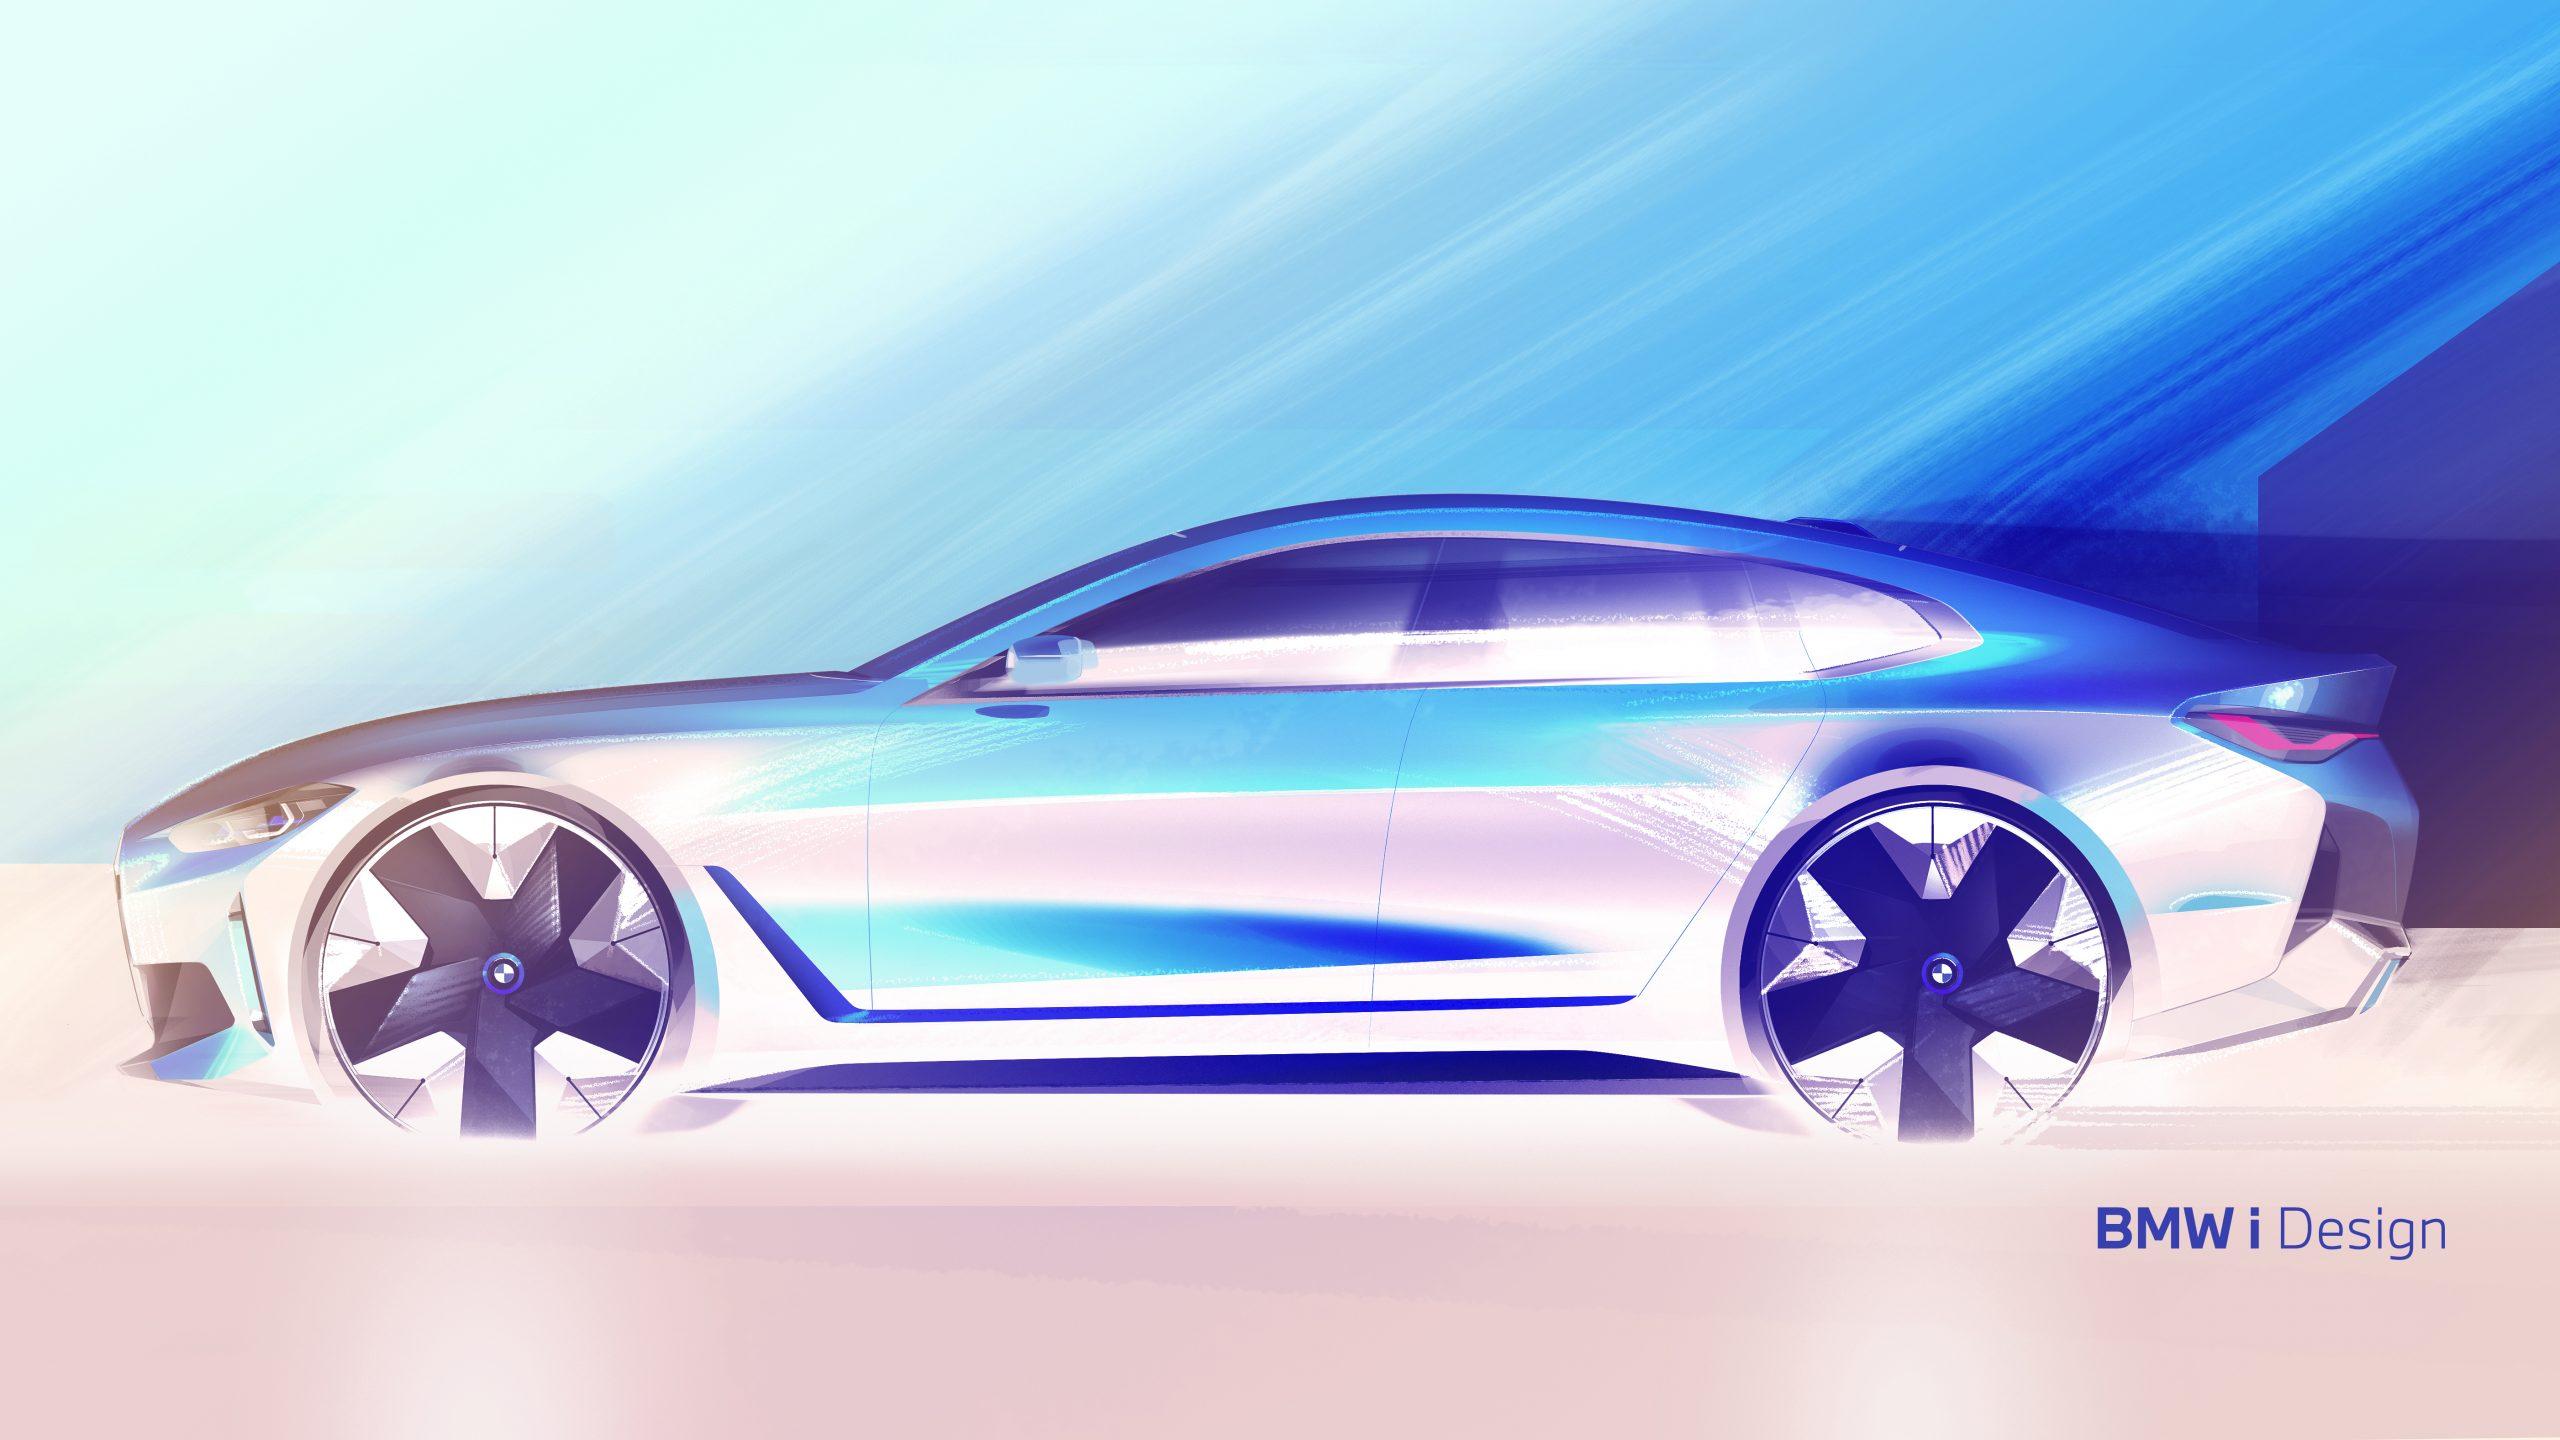 BMW i4 side profile sketch